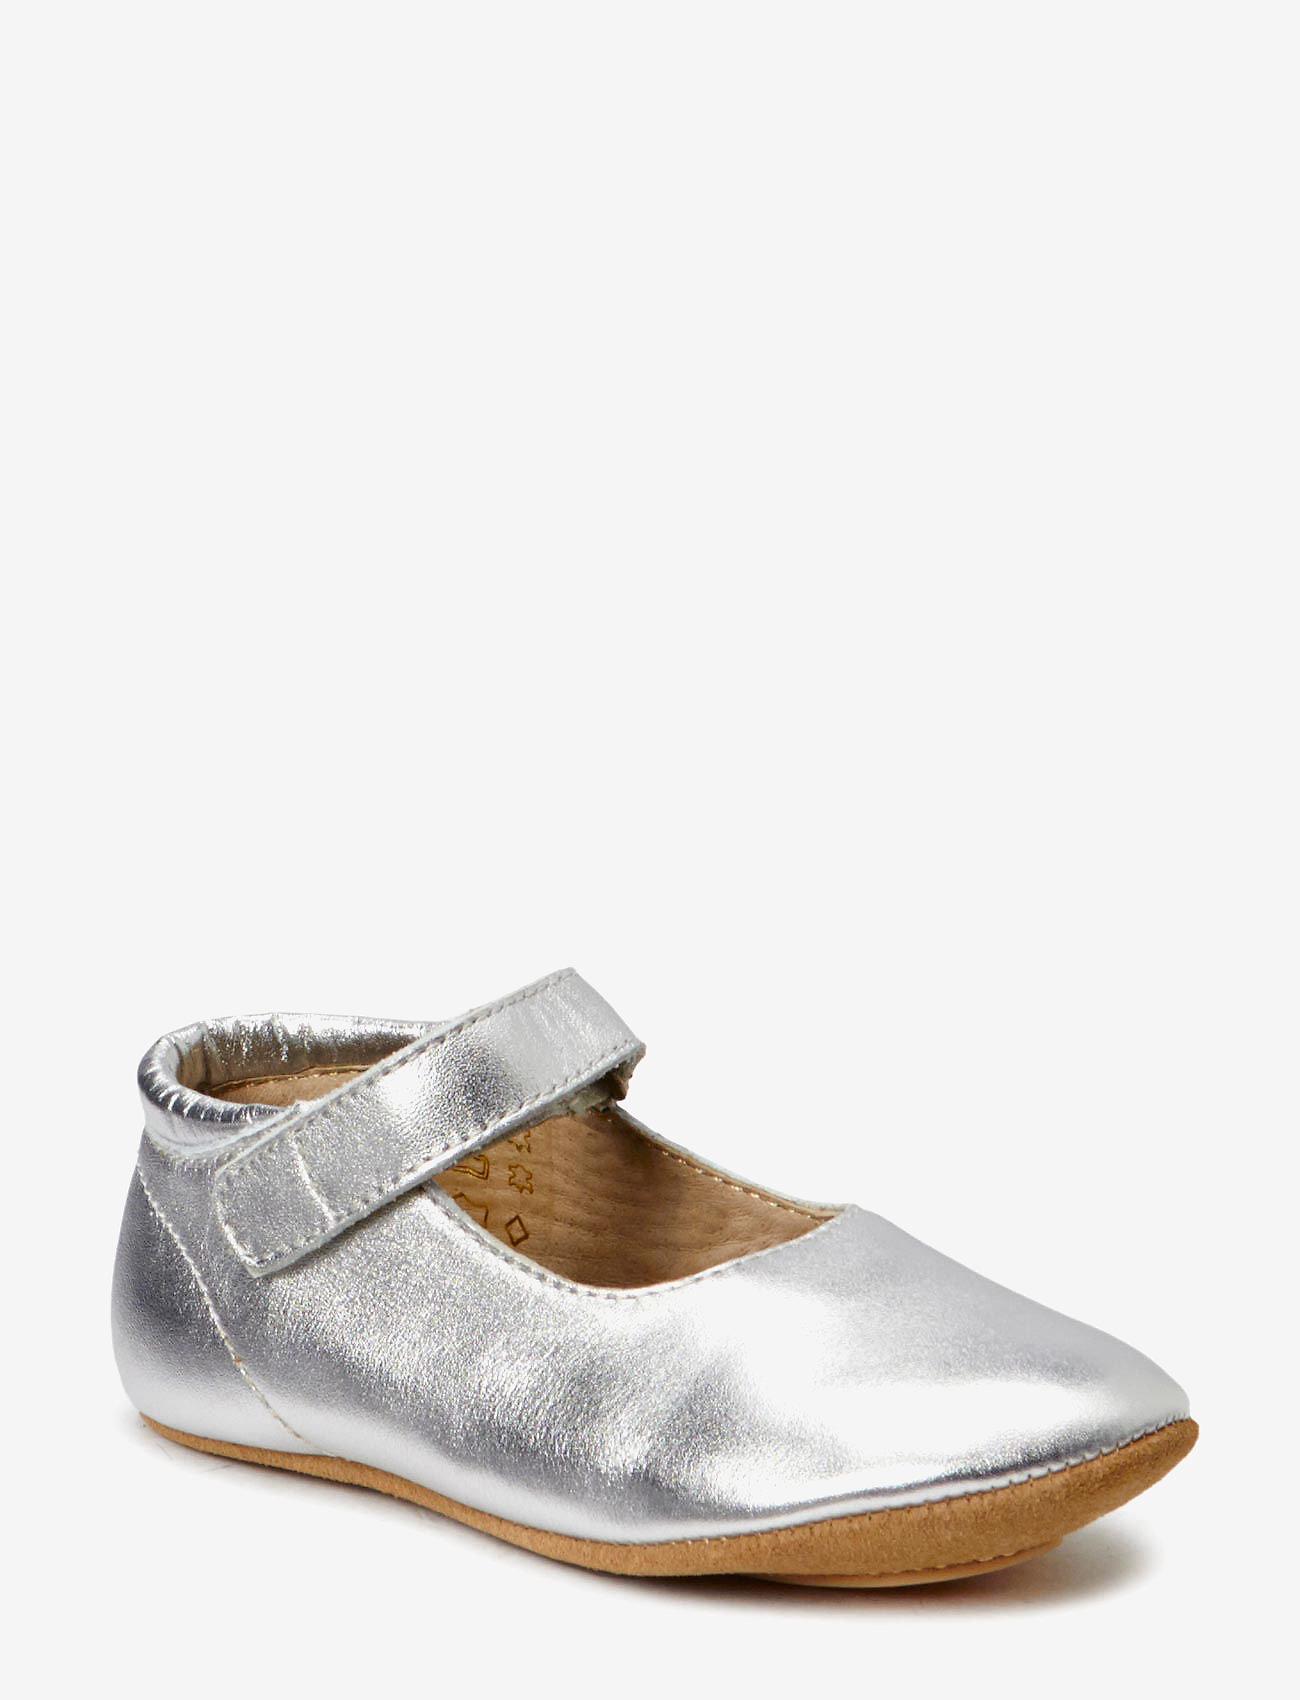 Bisgaard - SLIPPERS BALLERINA - 01 silver